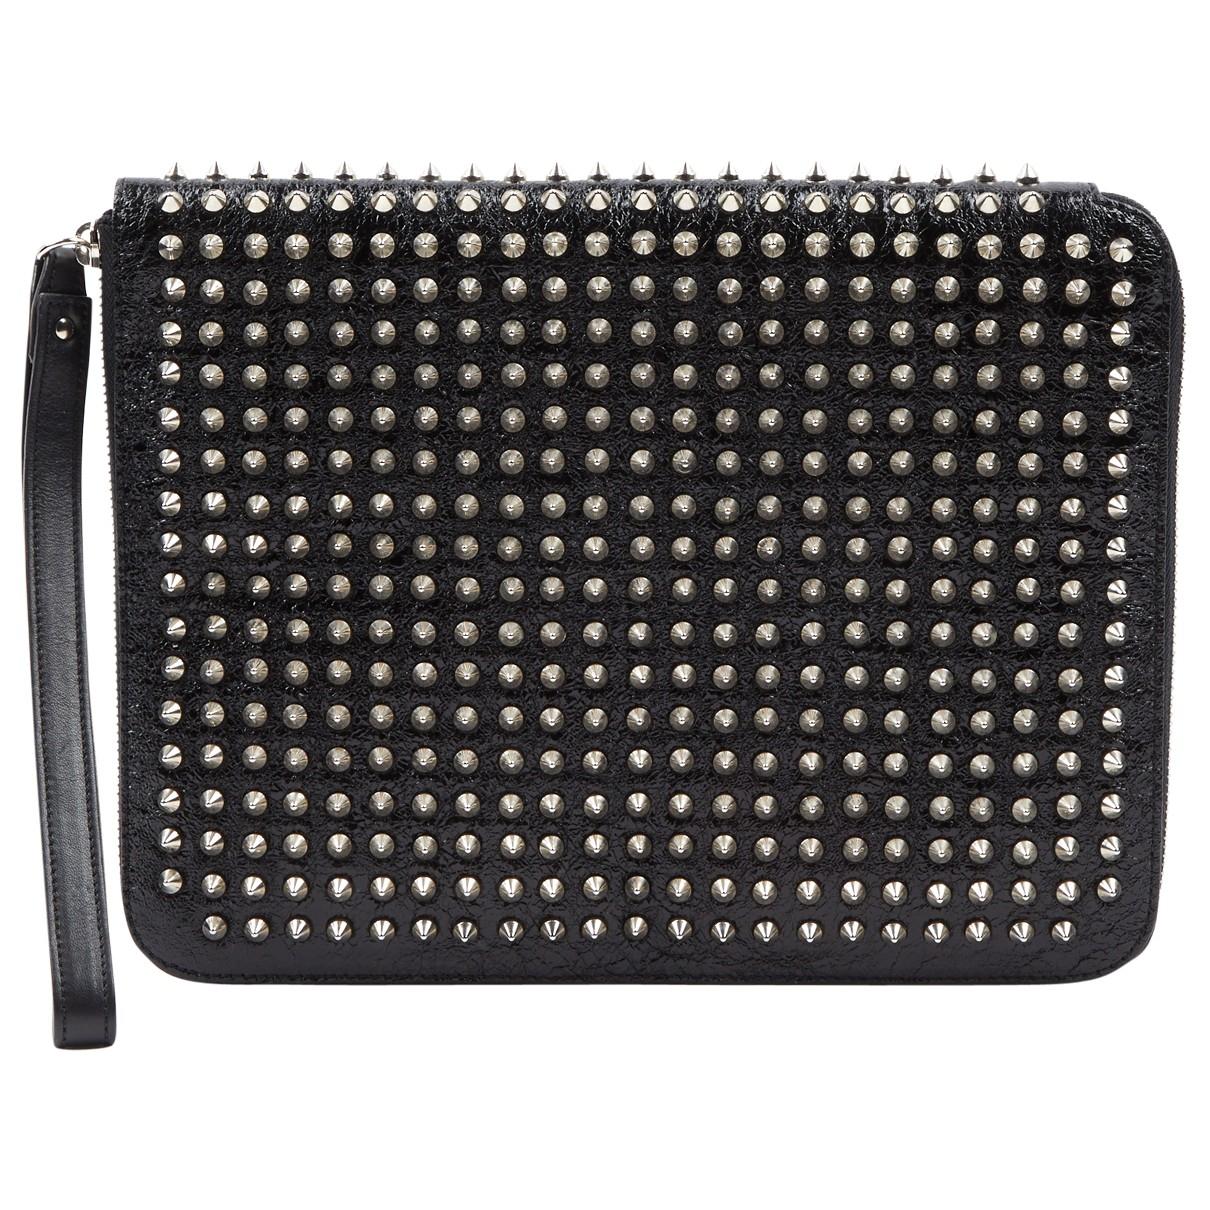 Christian Louboutin N Black Patent leather bag for Men N